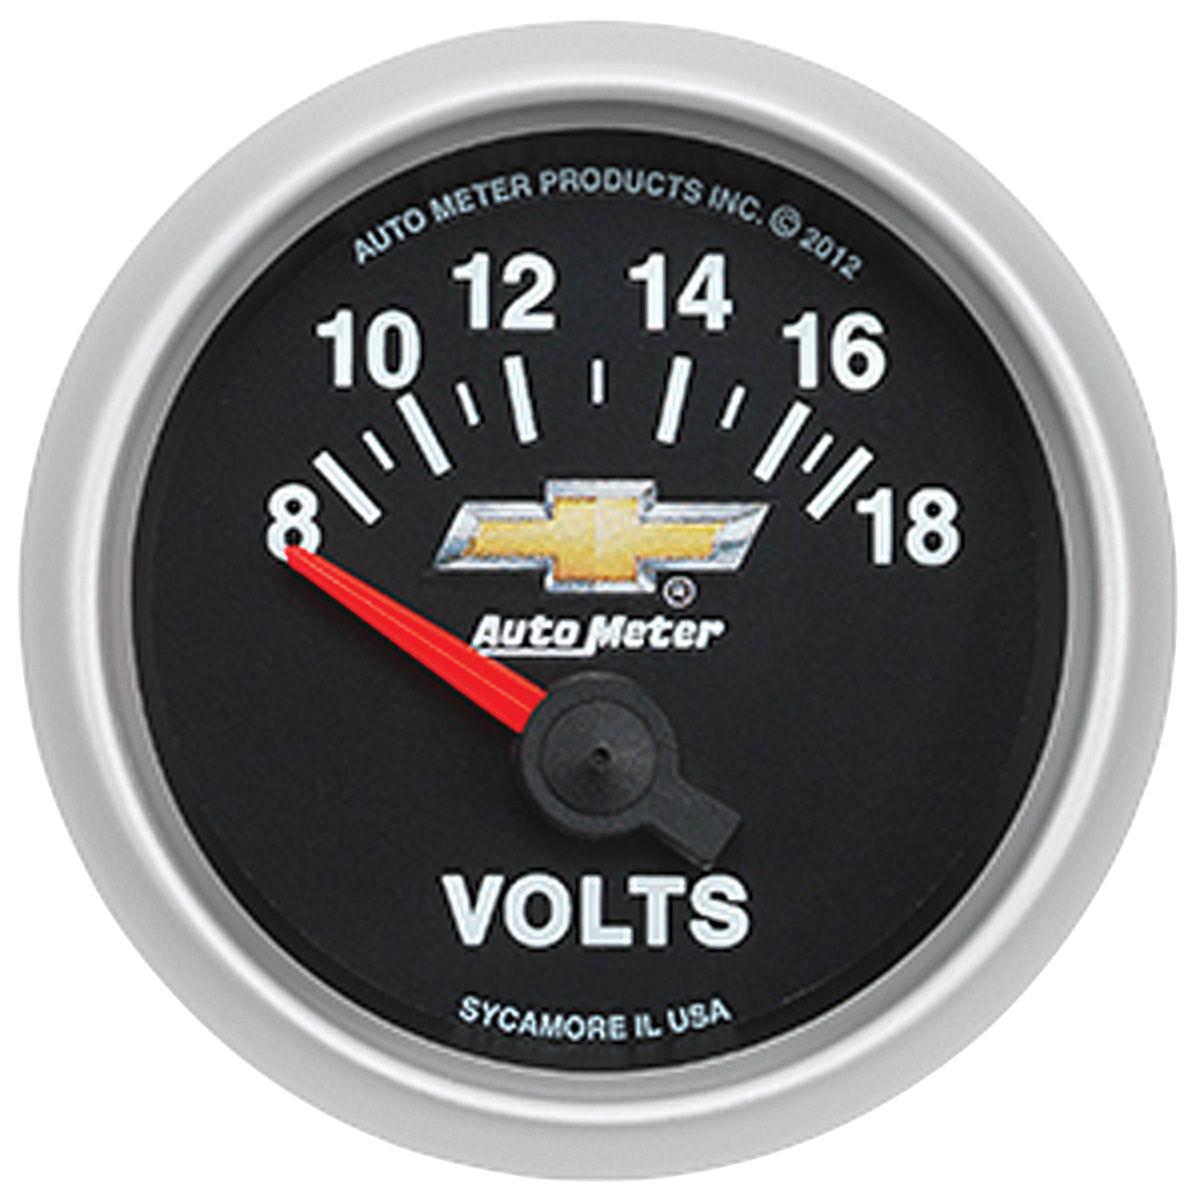 "Photo of El Camino Gauge, COPO Bowtie 2-1/16"" voltmeter, 8-18 volts"